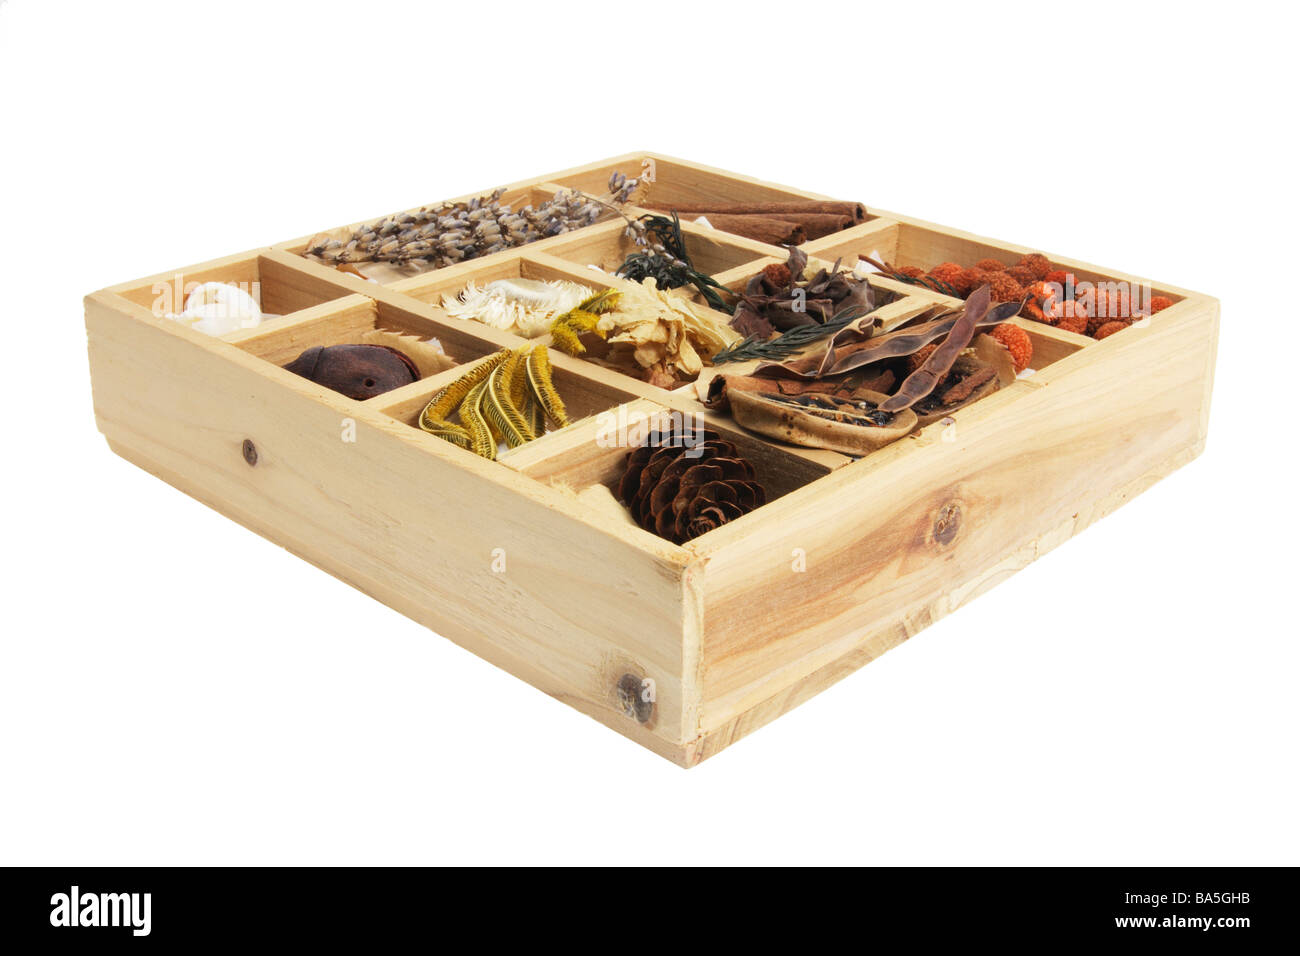 Box of Potpourri - Stock Image